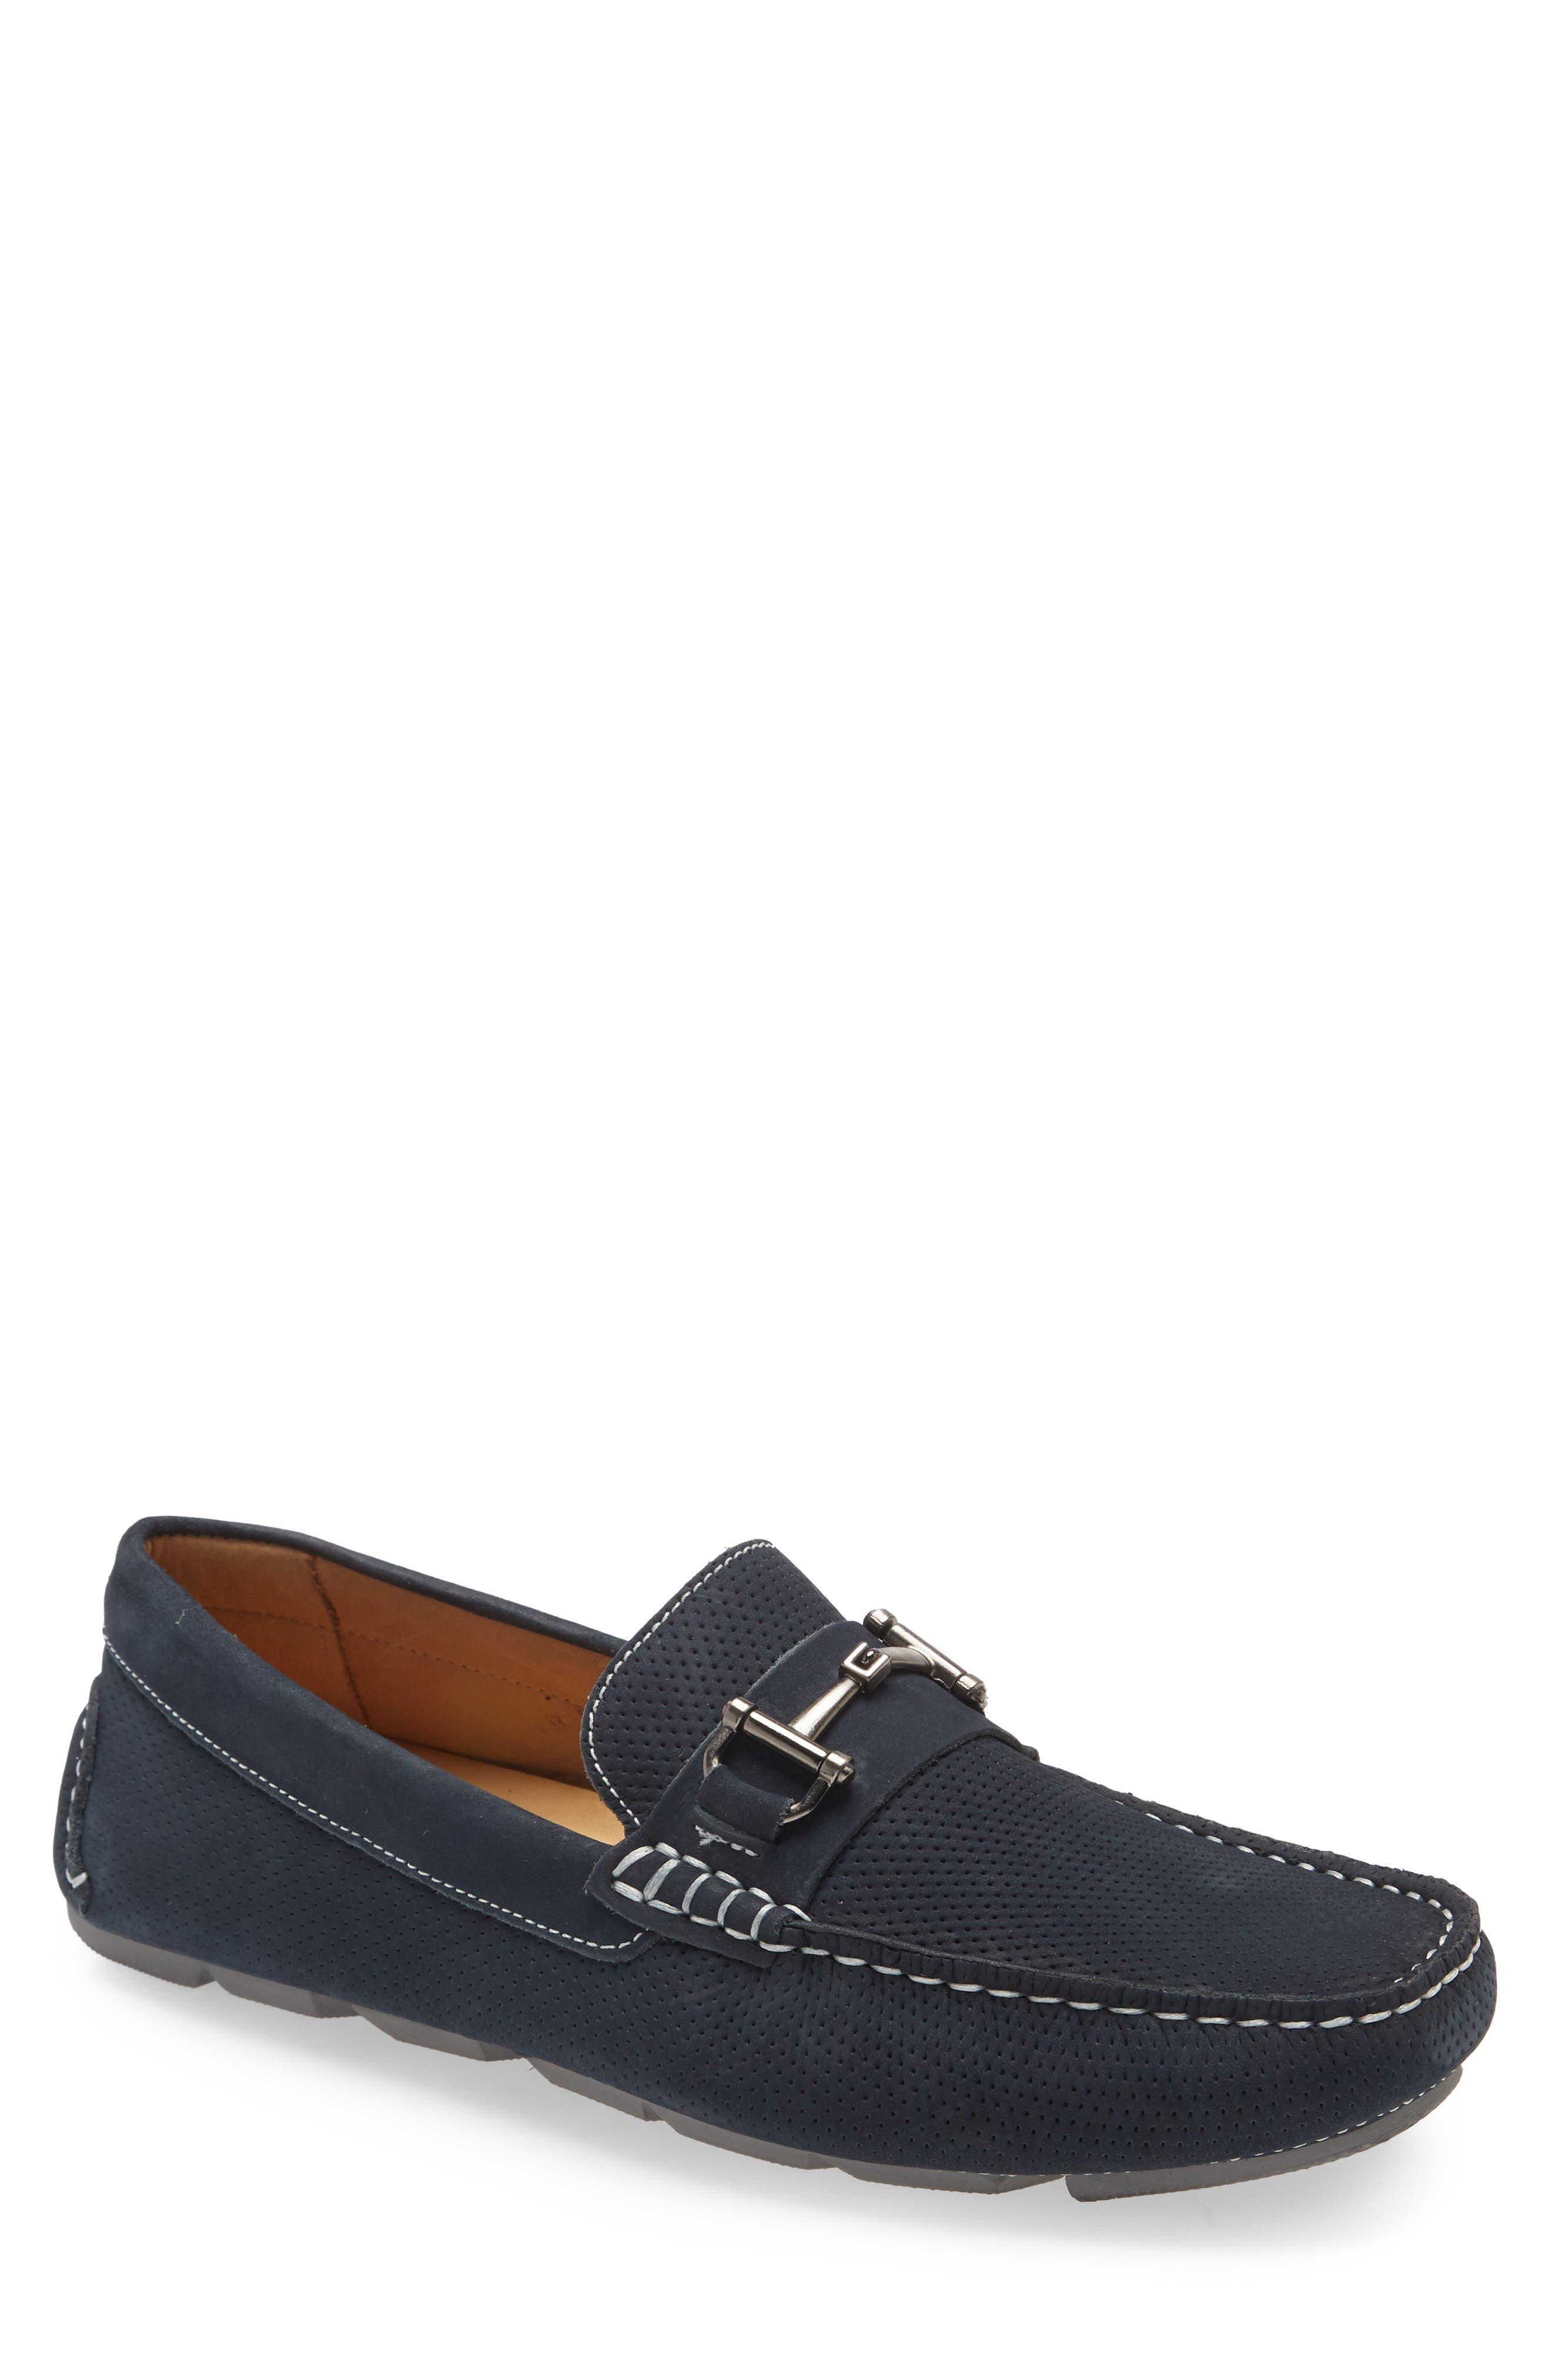 Men's Driving Loafers \u0026 Slip-Ons